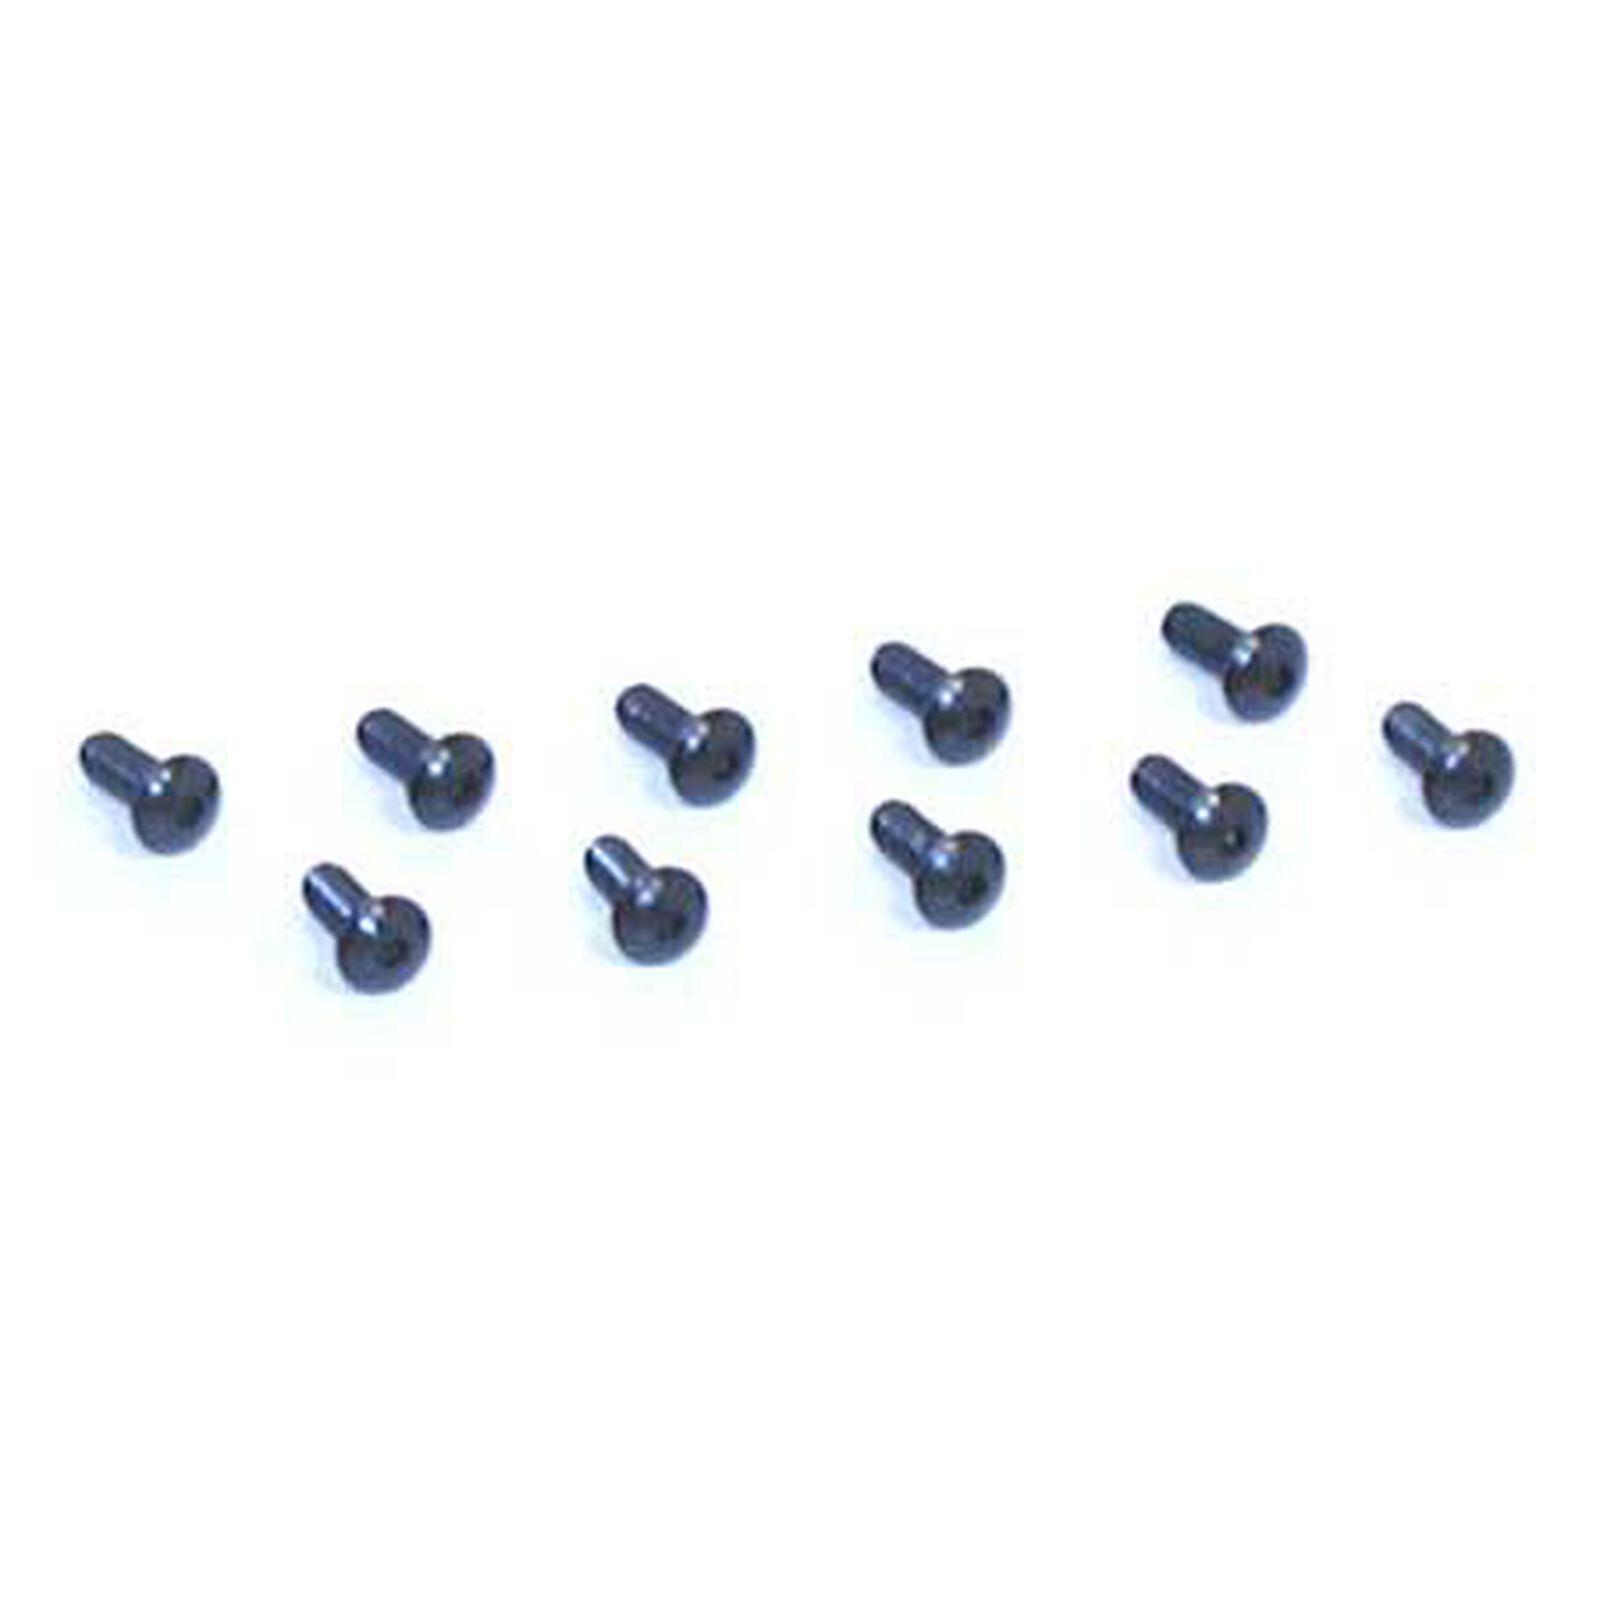 "Button Head Screws, 4-40 x 5/16"" (10)"